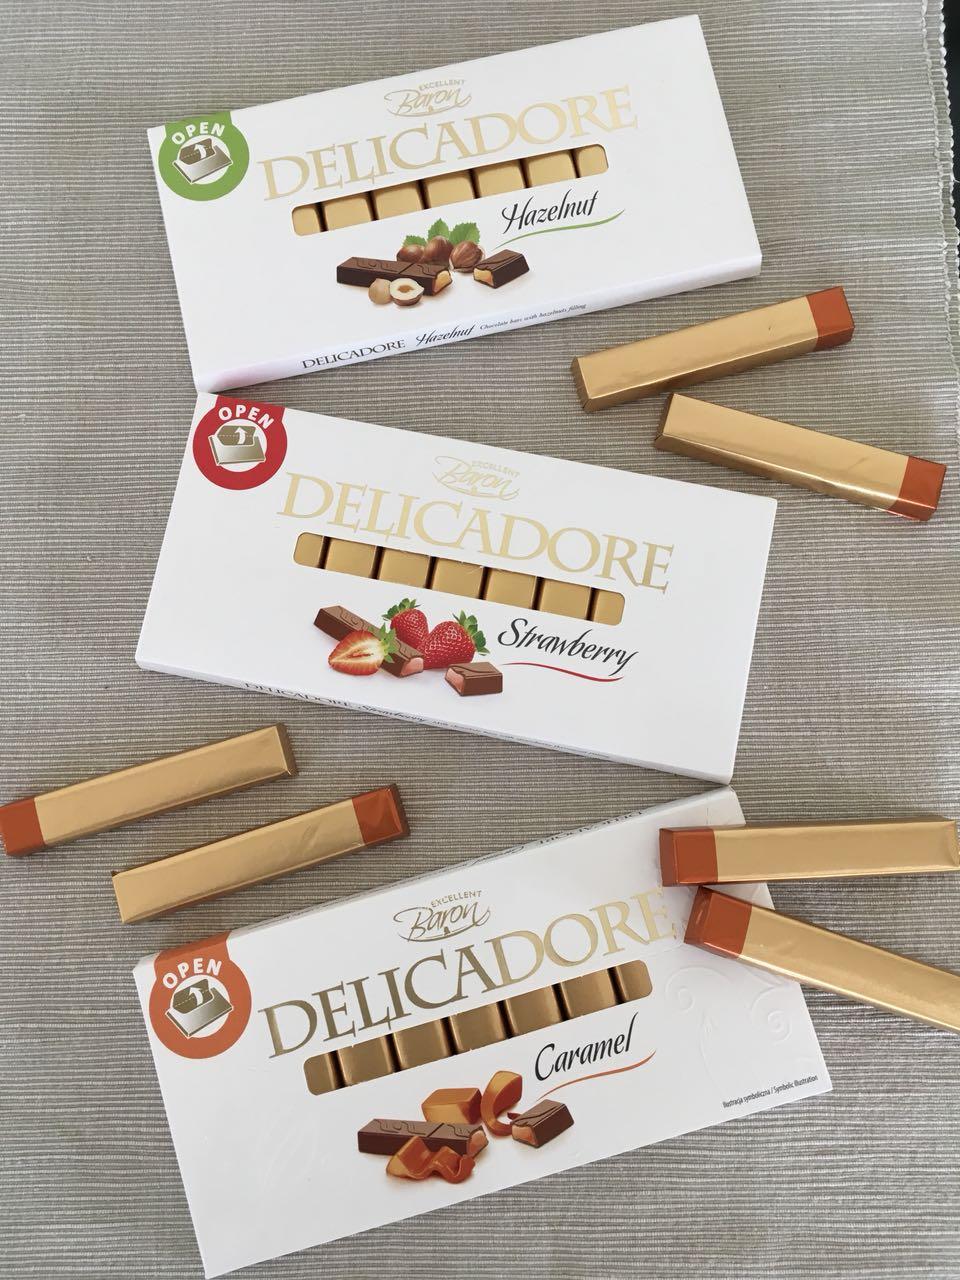 Baron Delicadore čokolade –razlog za raspoloženje